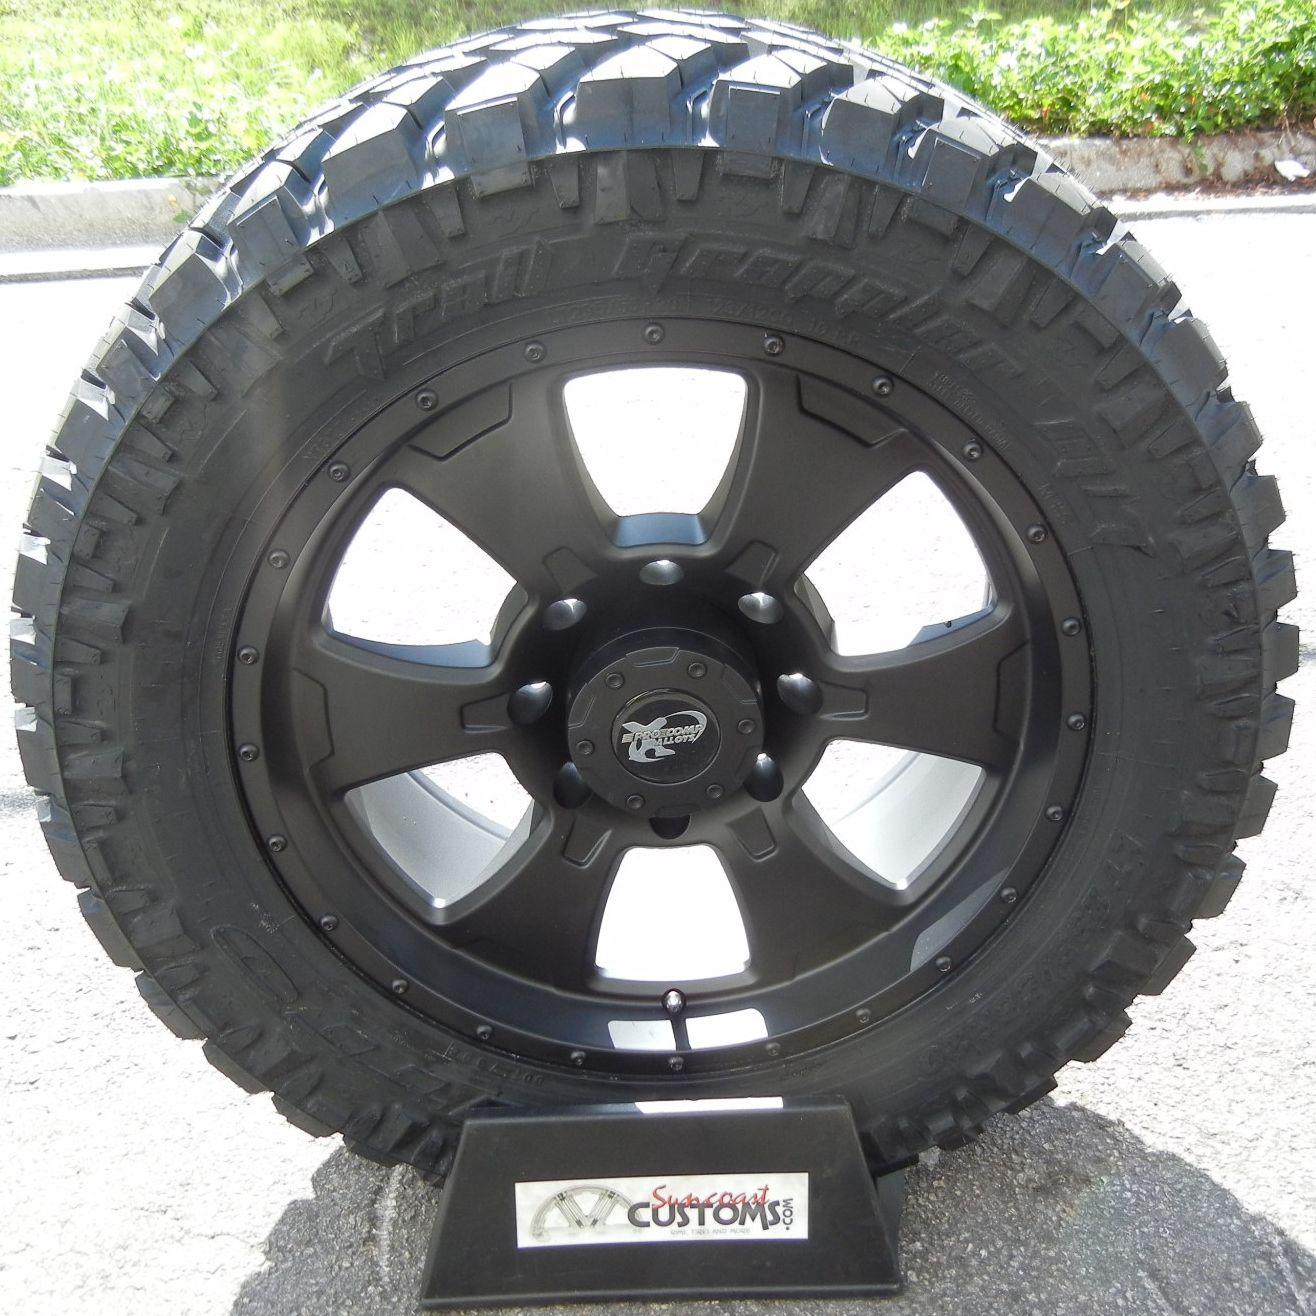 20 Black Procomp Wheels 33 Nitto Trail Tire Chevy Silverado GMC 2500